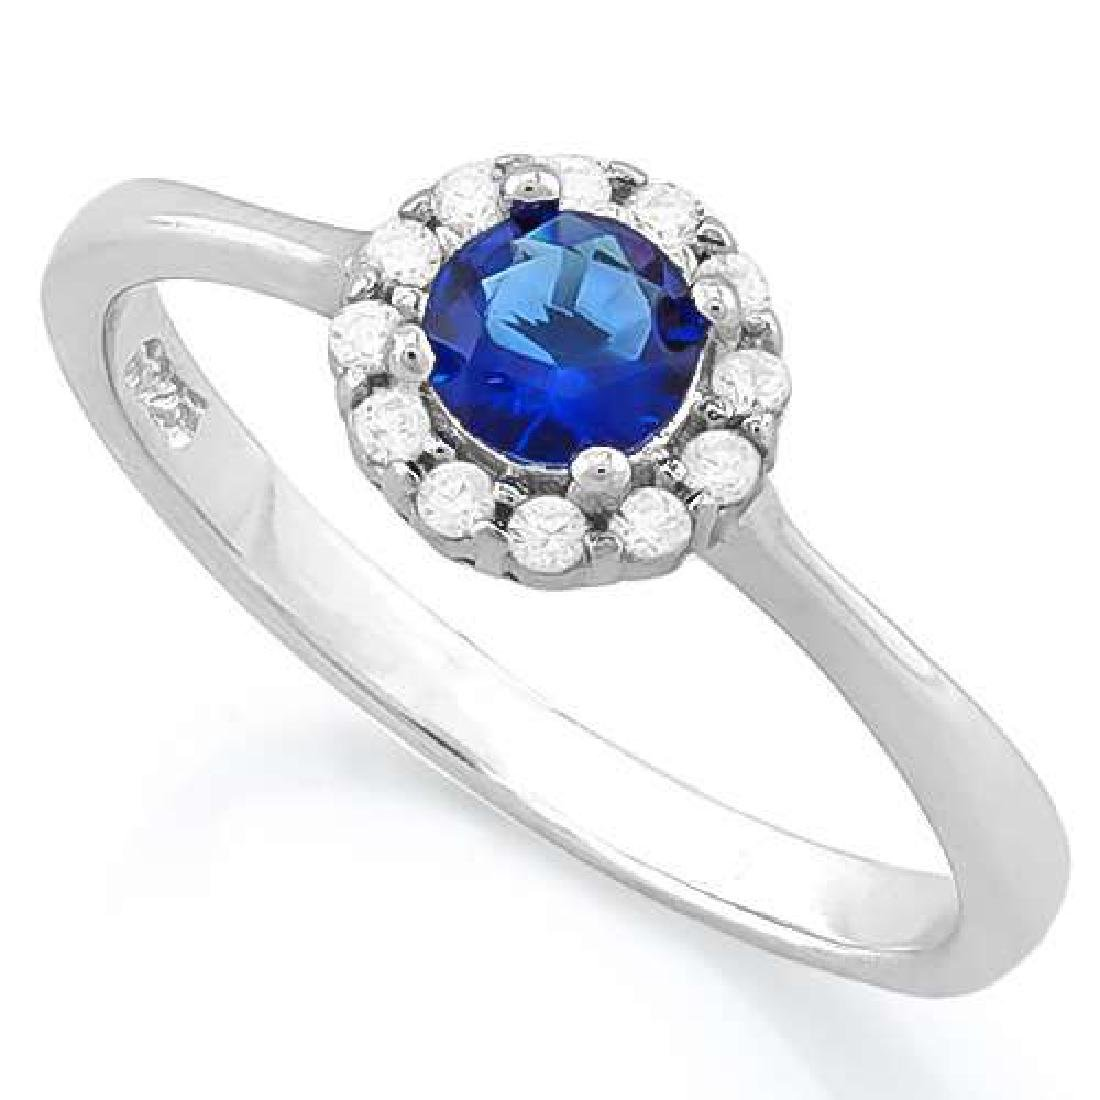 1/2 CTW CREATED BLUE SAPPHIRE & (12 PCS) FLAWLESS CREAT